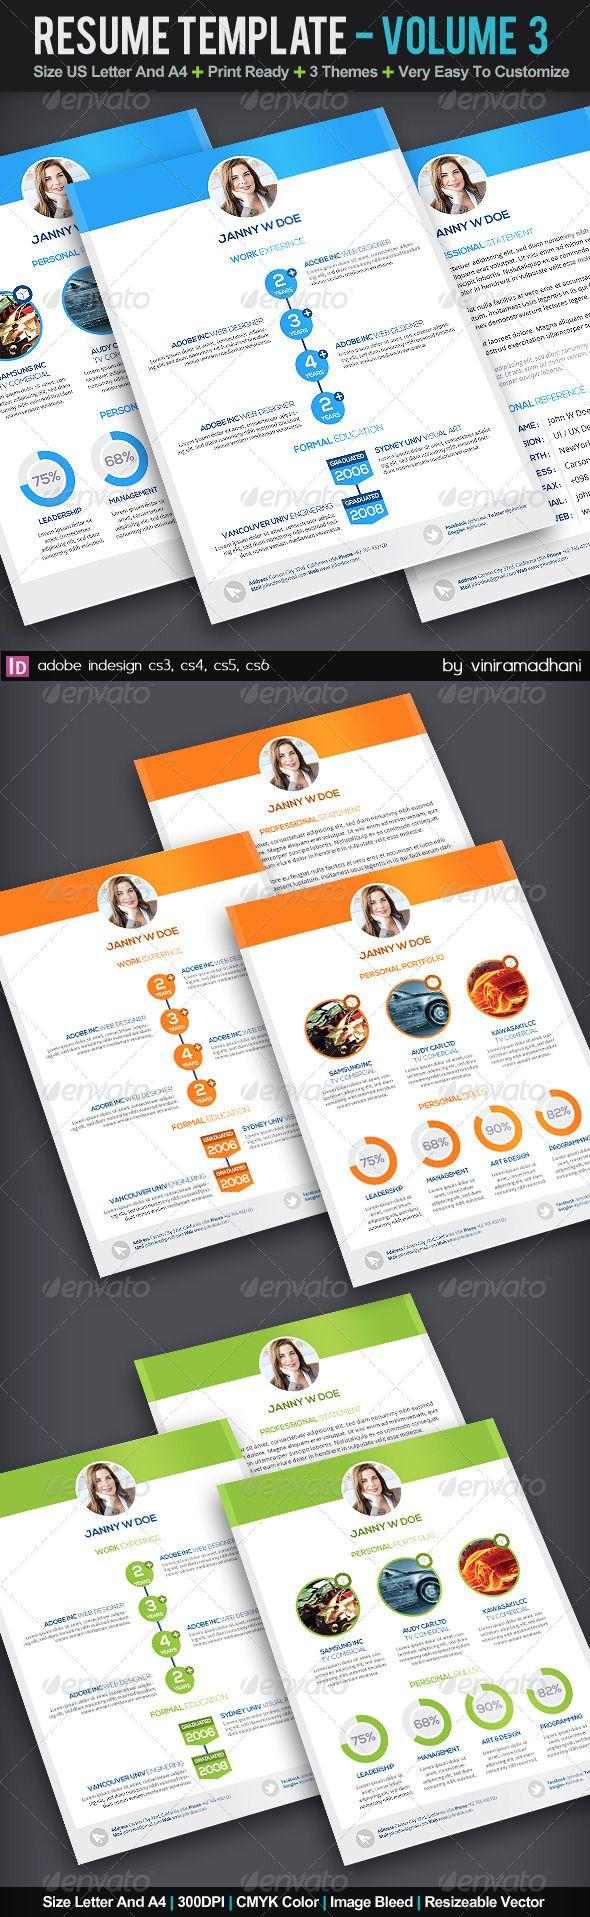 resume template volume 3 graphicriver specs adobe indesign cs3